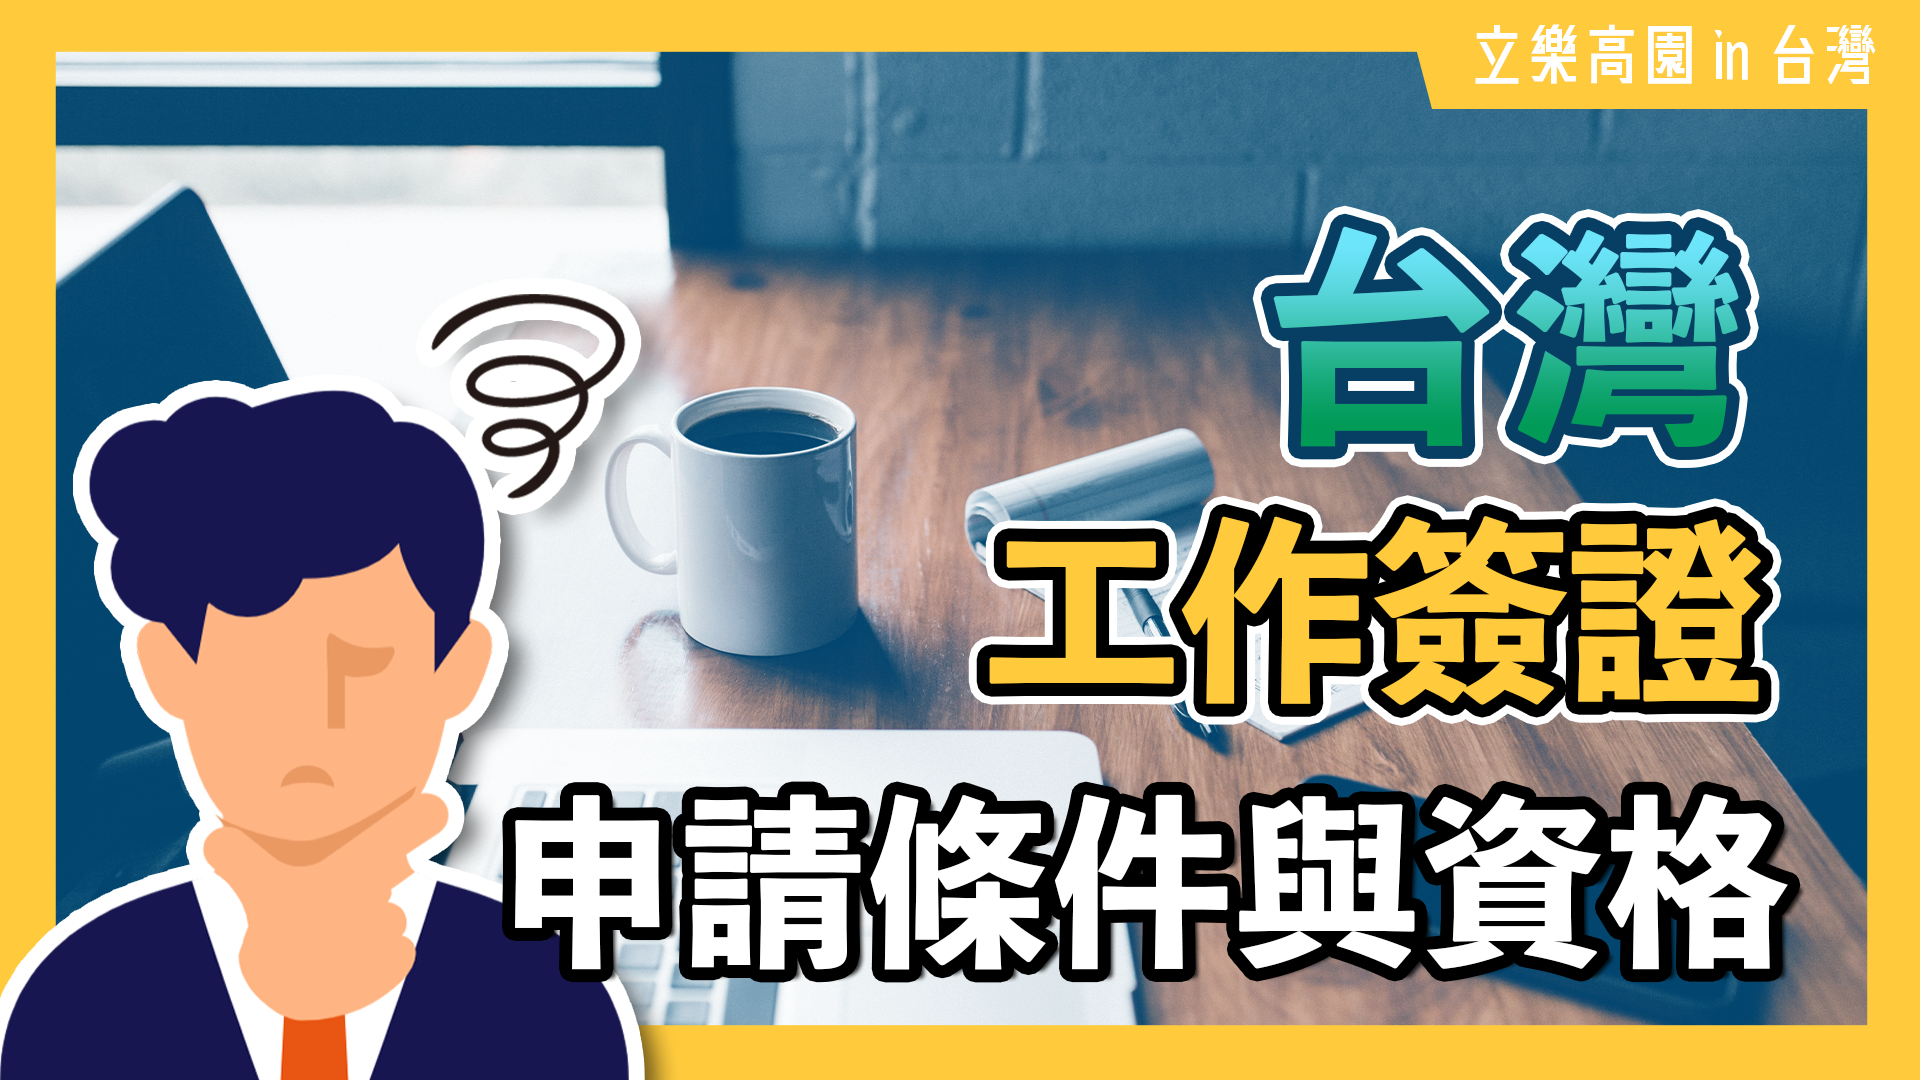 【DAILY】外國人該如何在台灣申請「工作簽證」台灣生活工作相關解說#5| 立樂高園 in 台灣